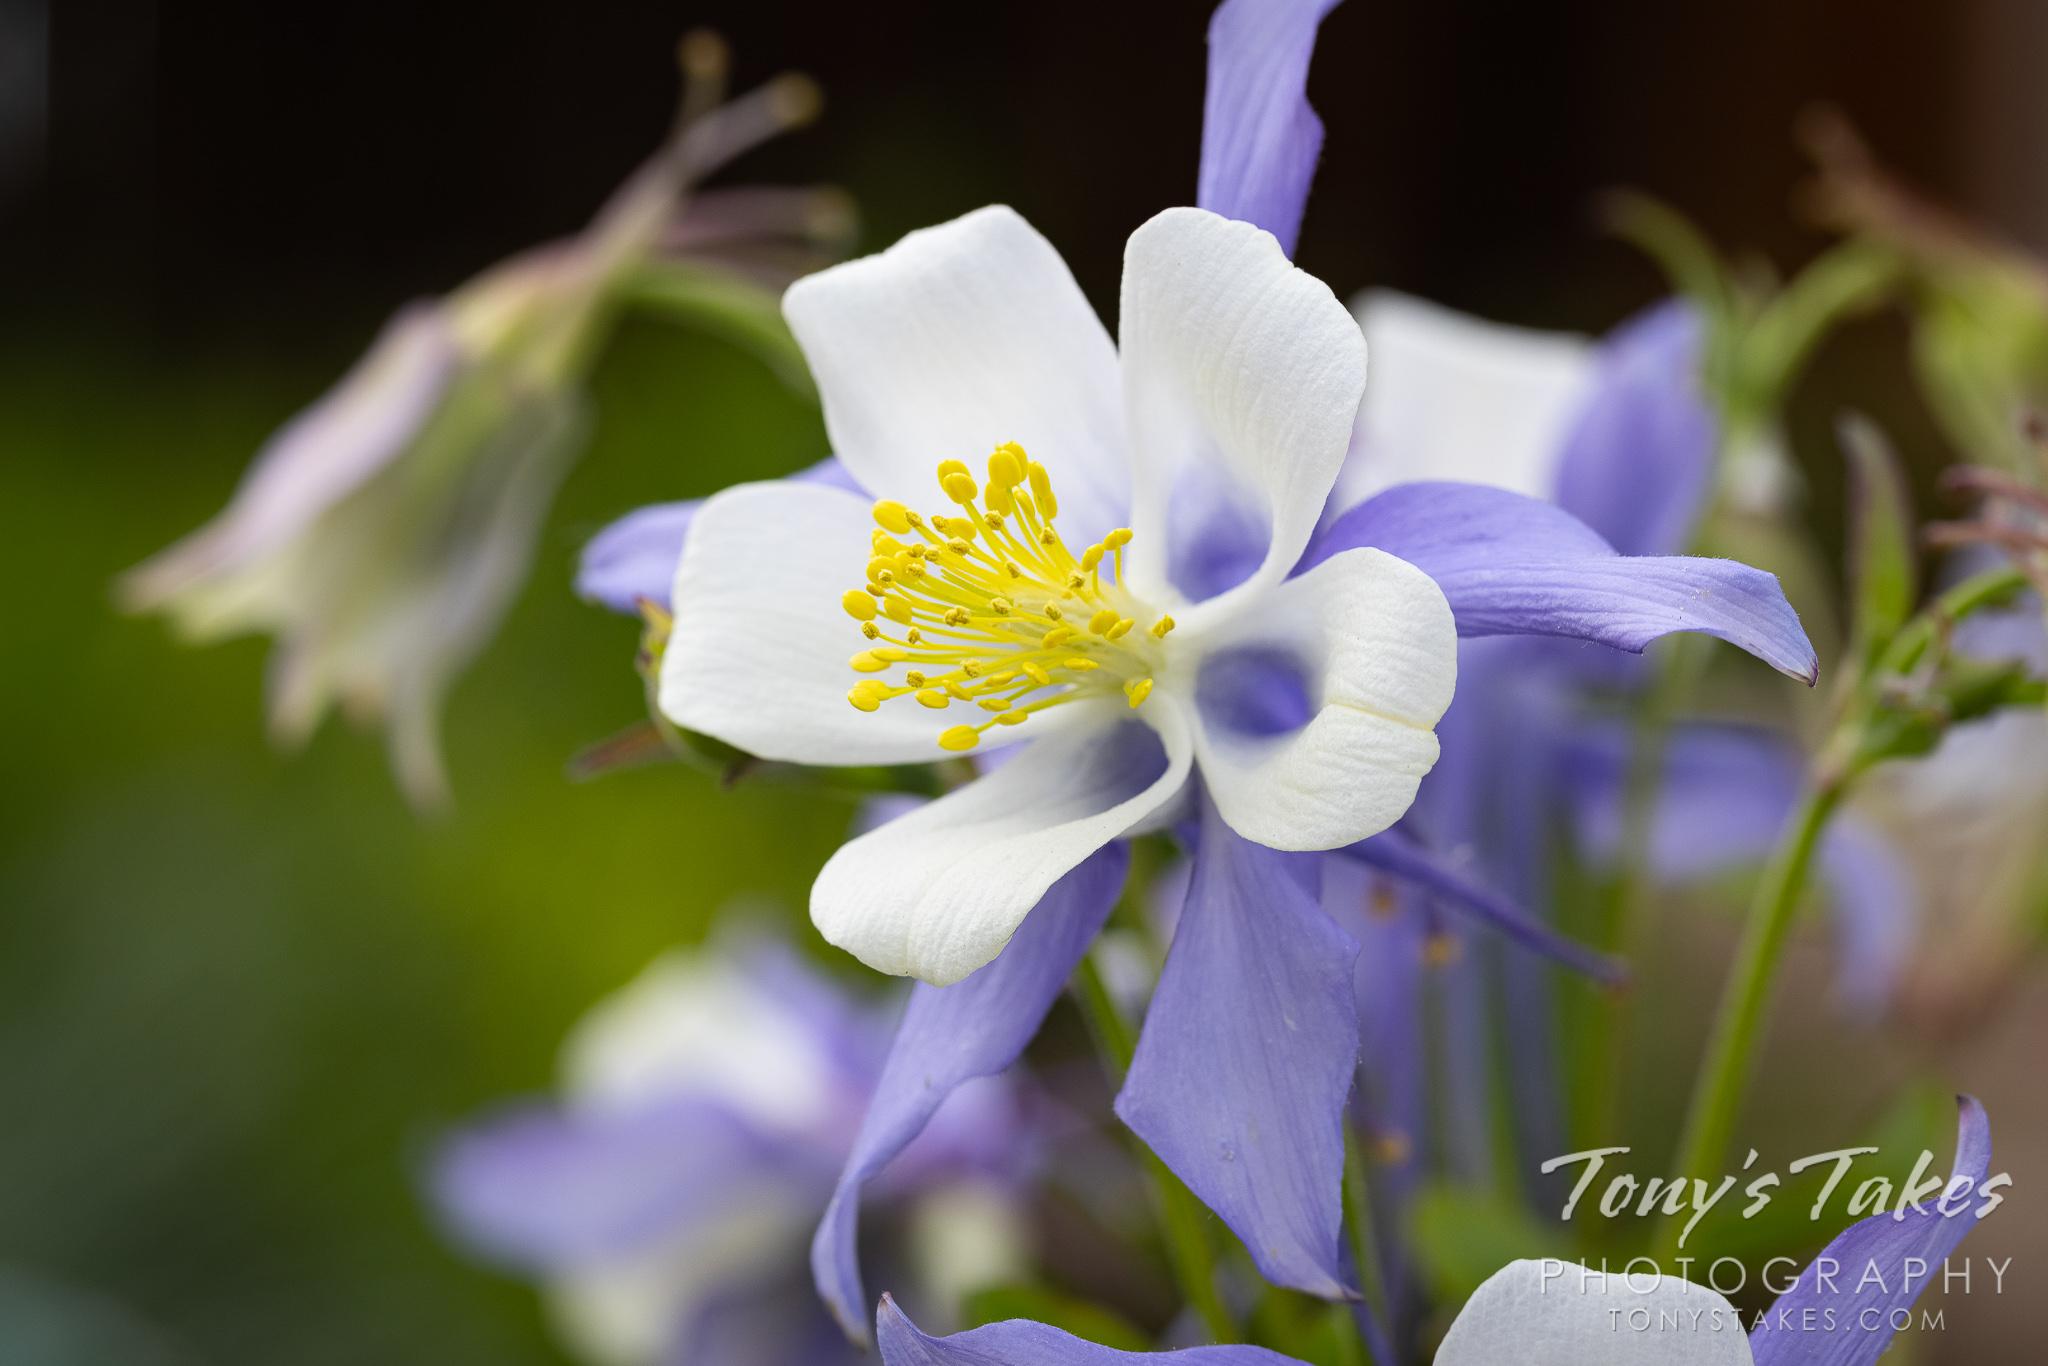 First springtime backyard flower photo session